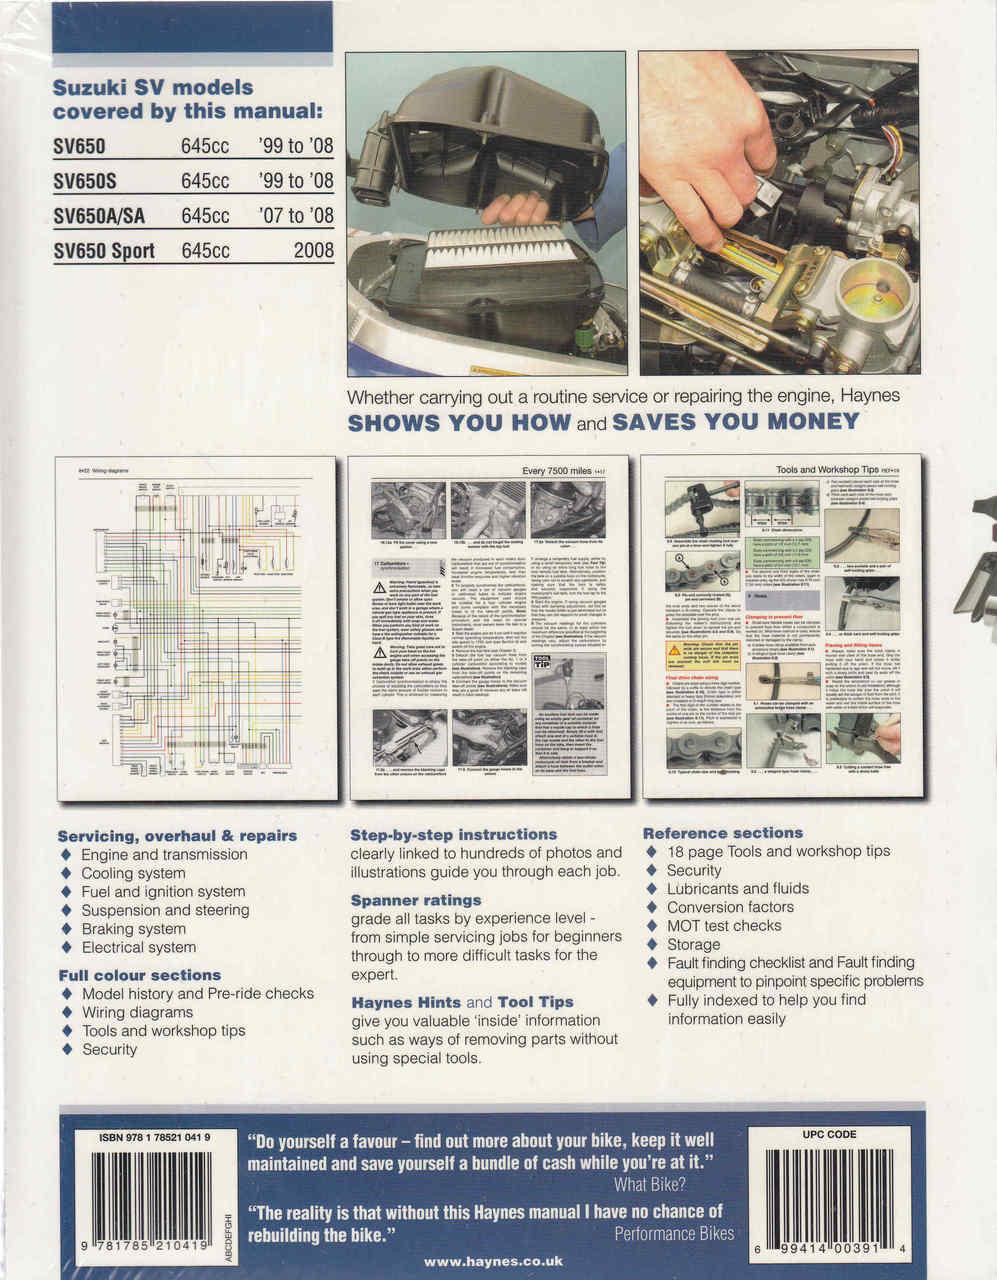 2008 Sv650 Wiring Diagram Library. Suzuki Sv650 Sv650s 1999 2008 Workshop Manual 9781785210419. Wiring. Gen 2 Sv650 Wiring Diagram At Scoala.co